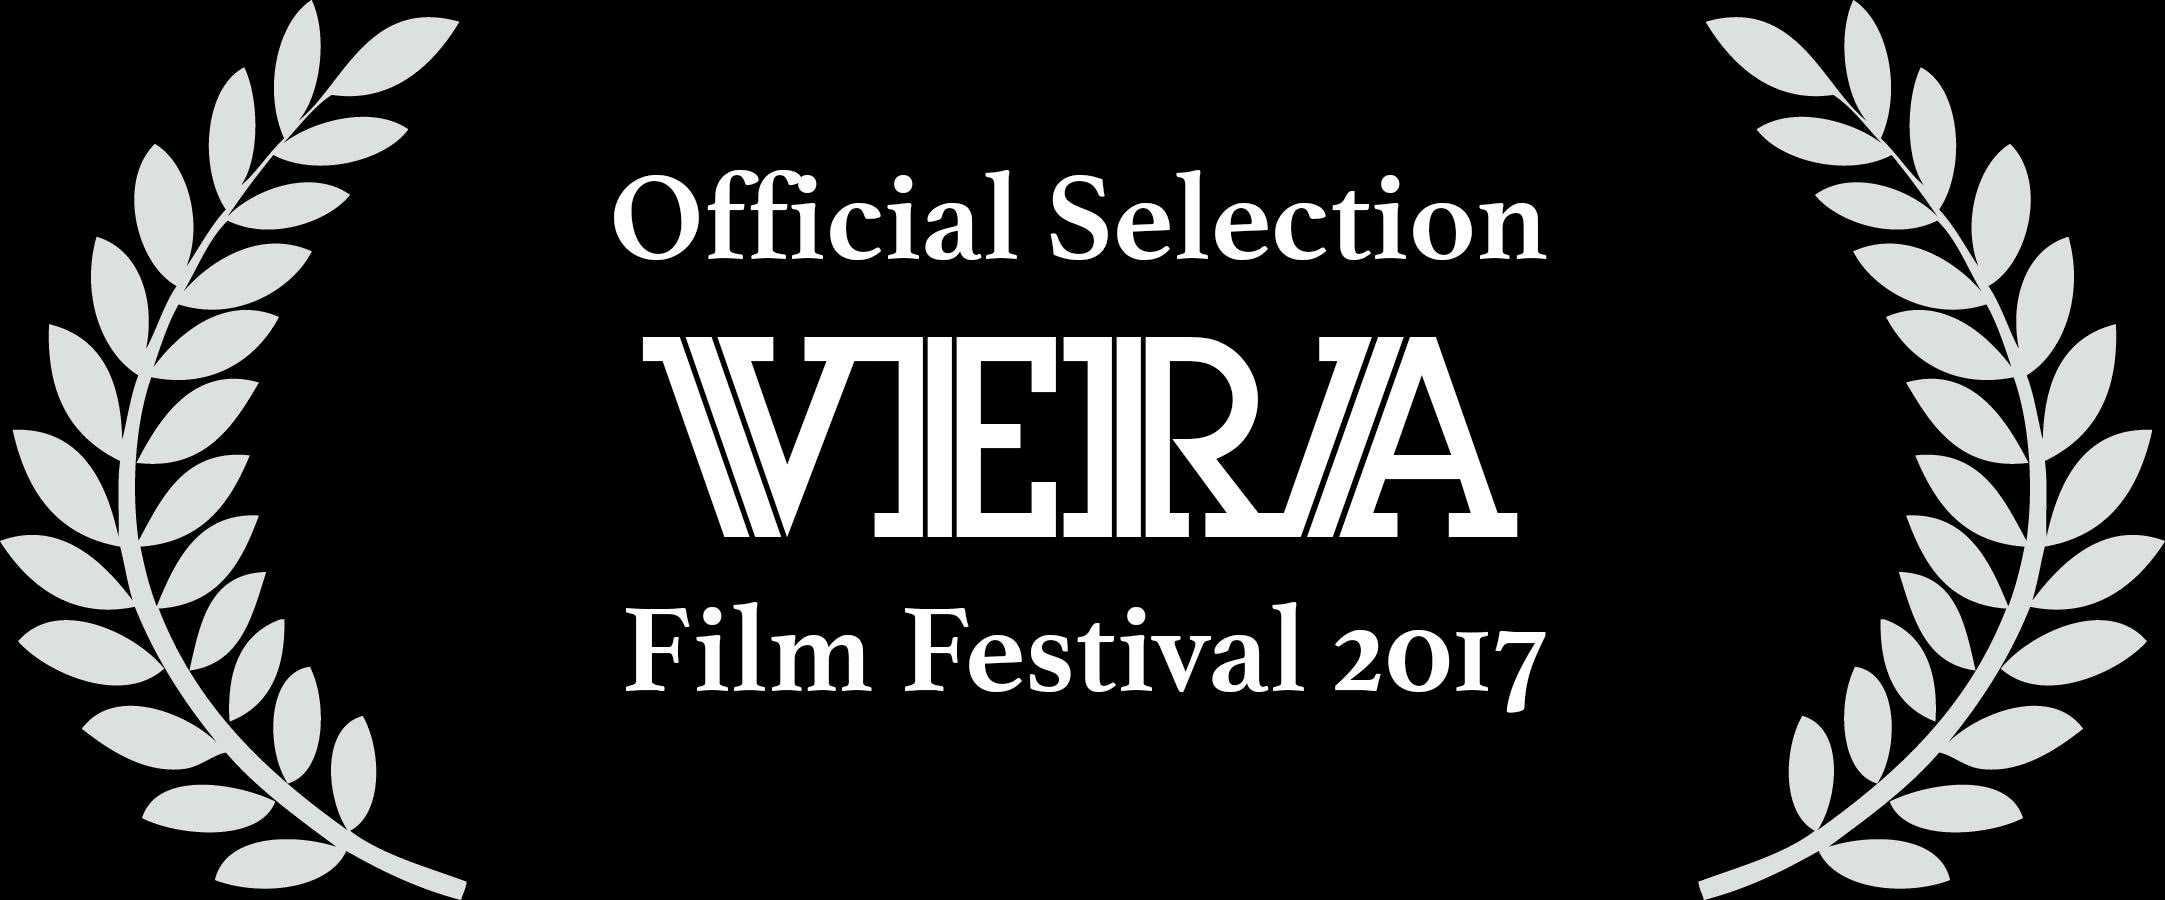 VERA Film Festival Laurels .png